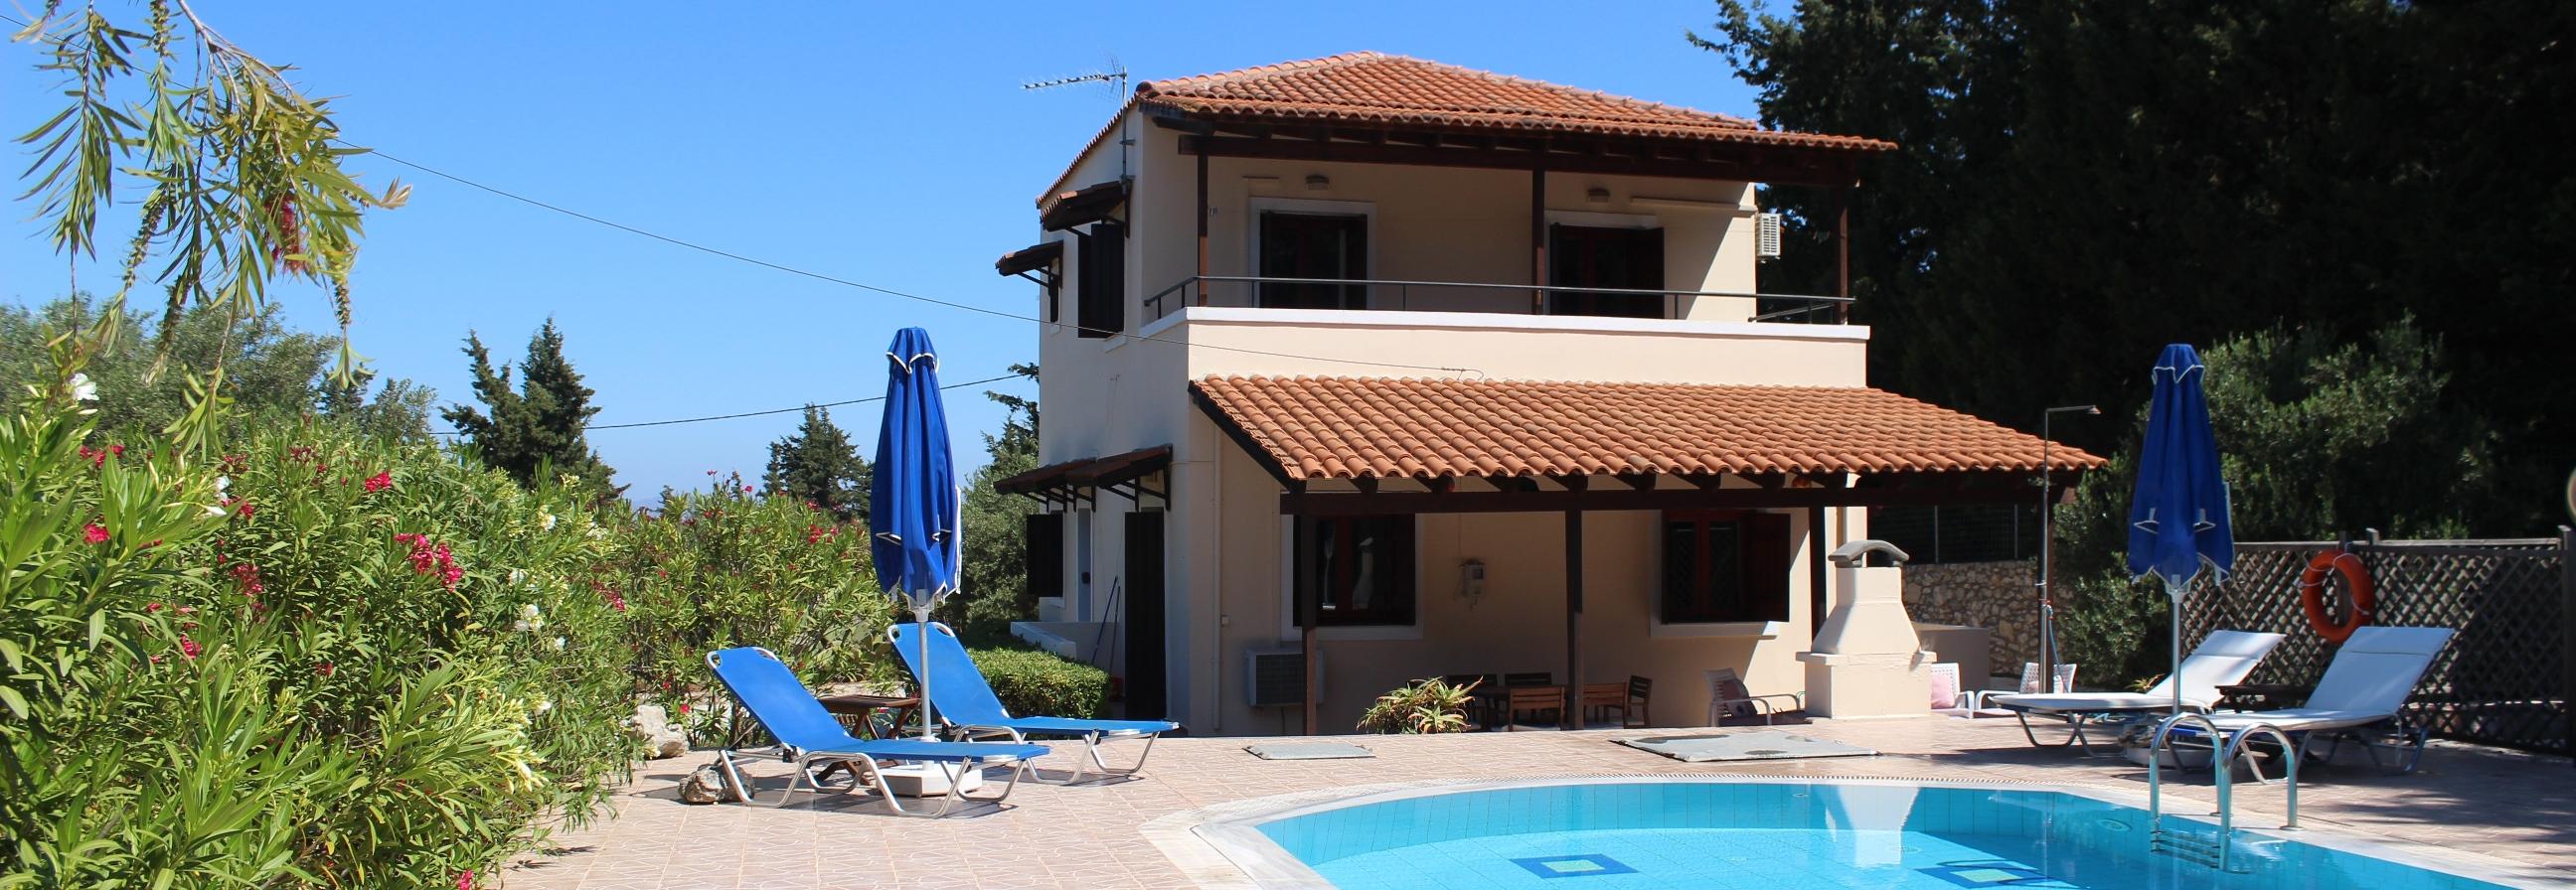 DC-668 3 Bed Villa in Xirosterni €345,000